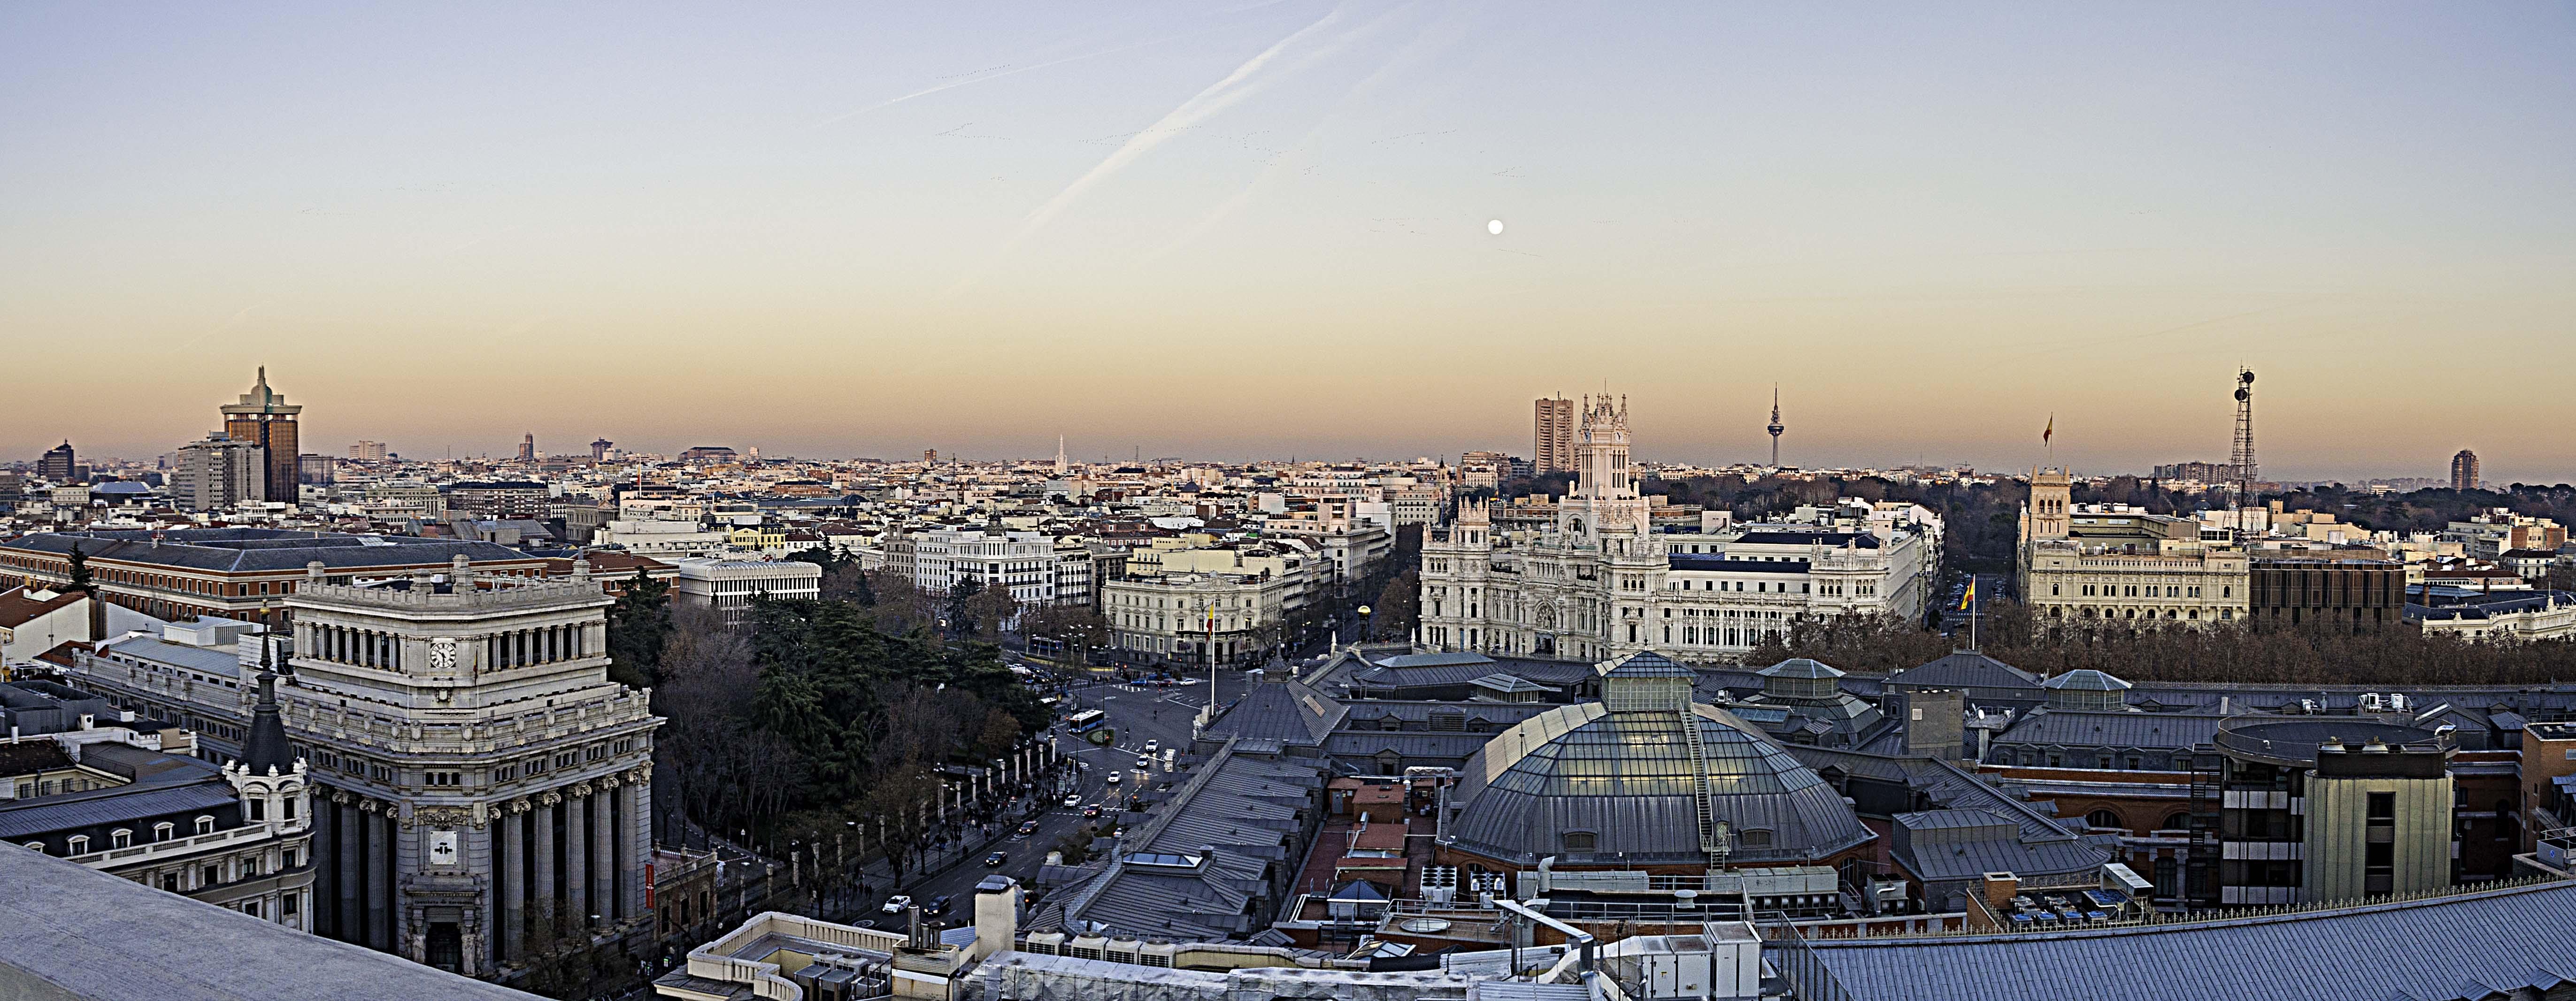 City Landscape during Sunset